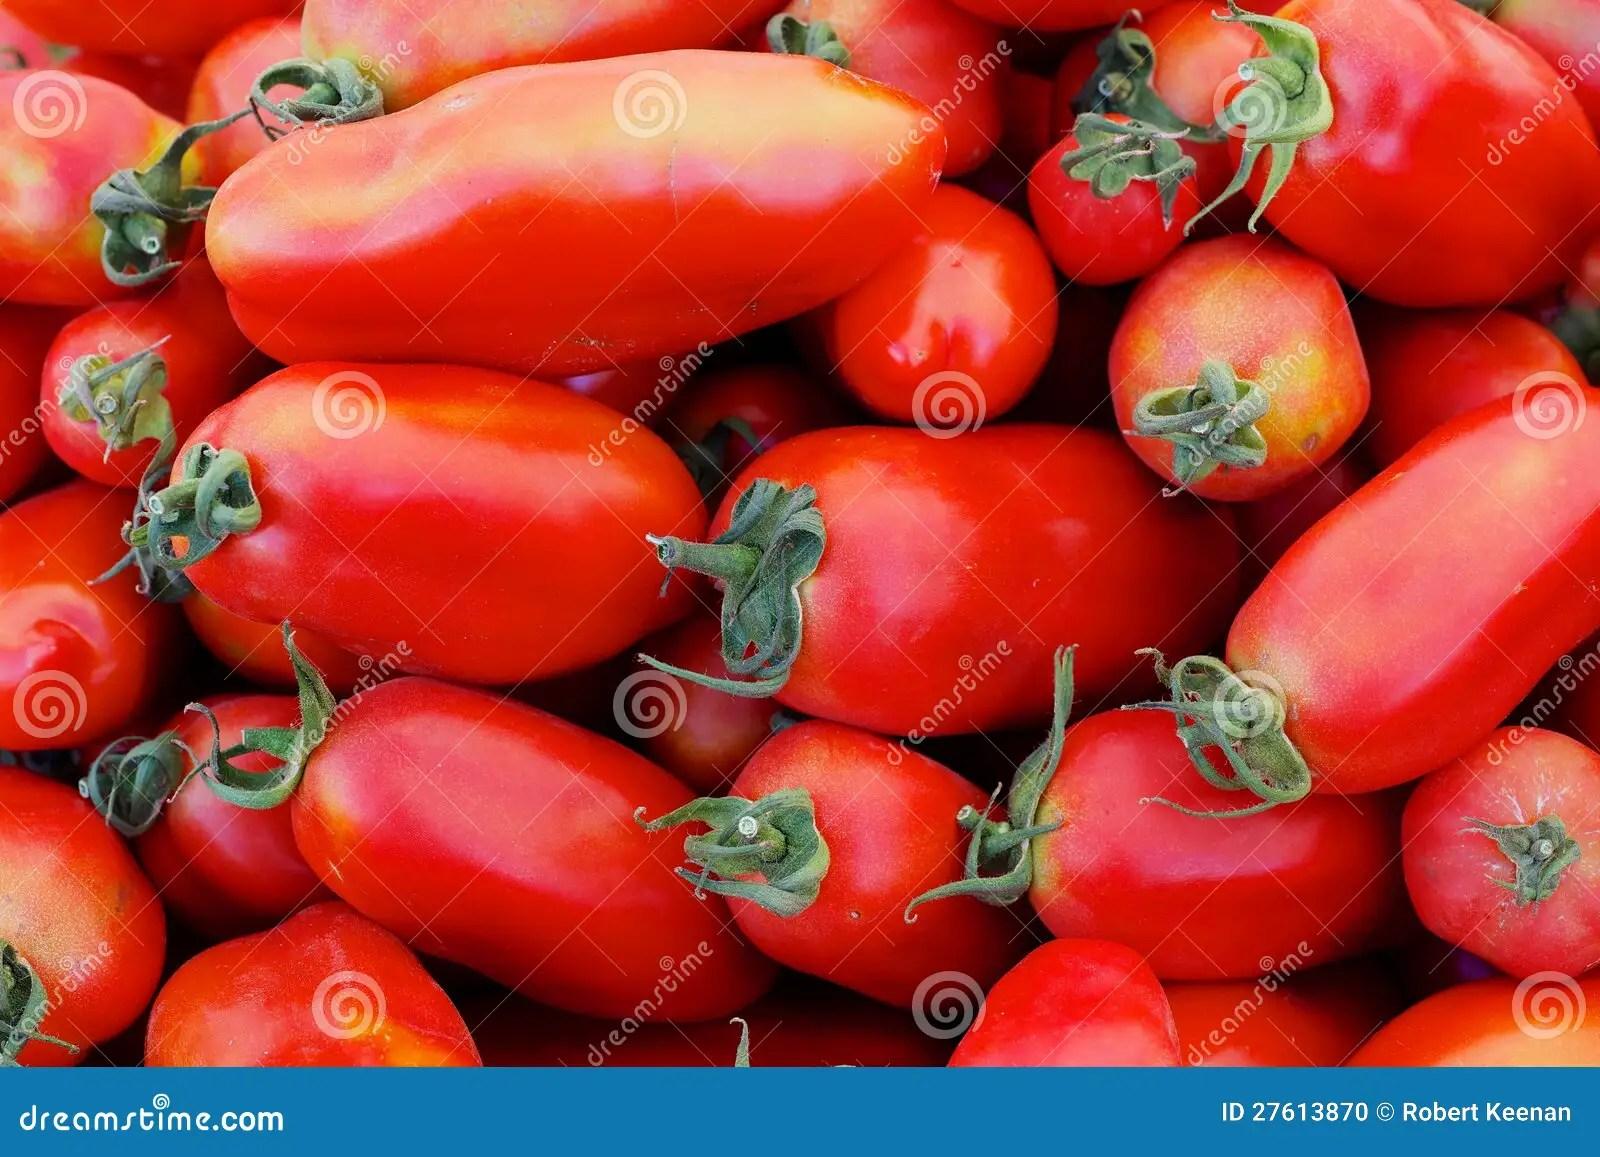 Italian Tomatoes Stock Photo - Image: 27613870